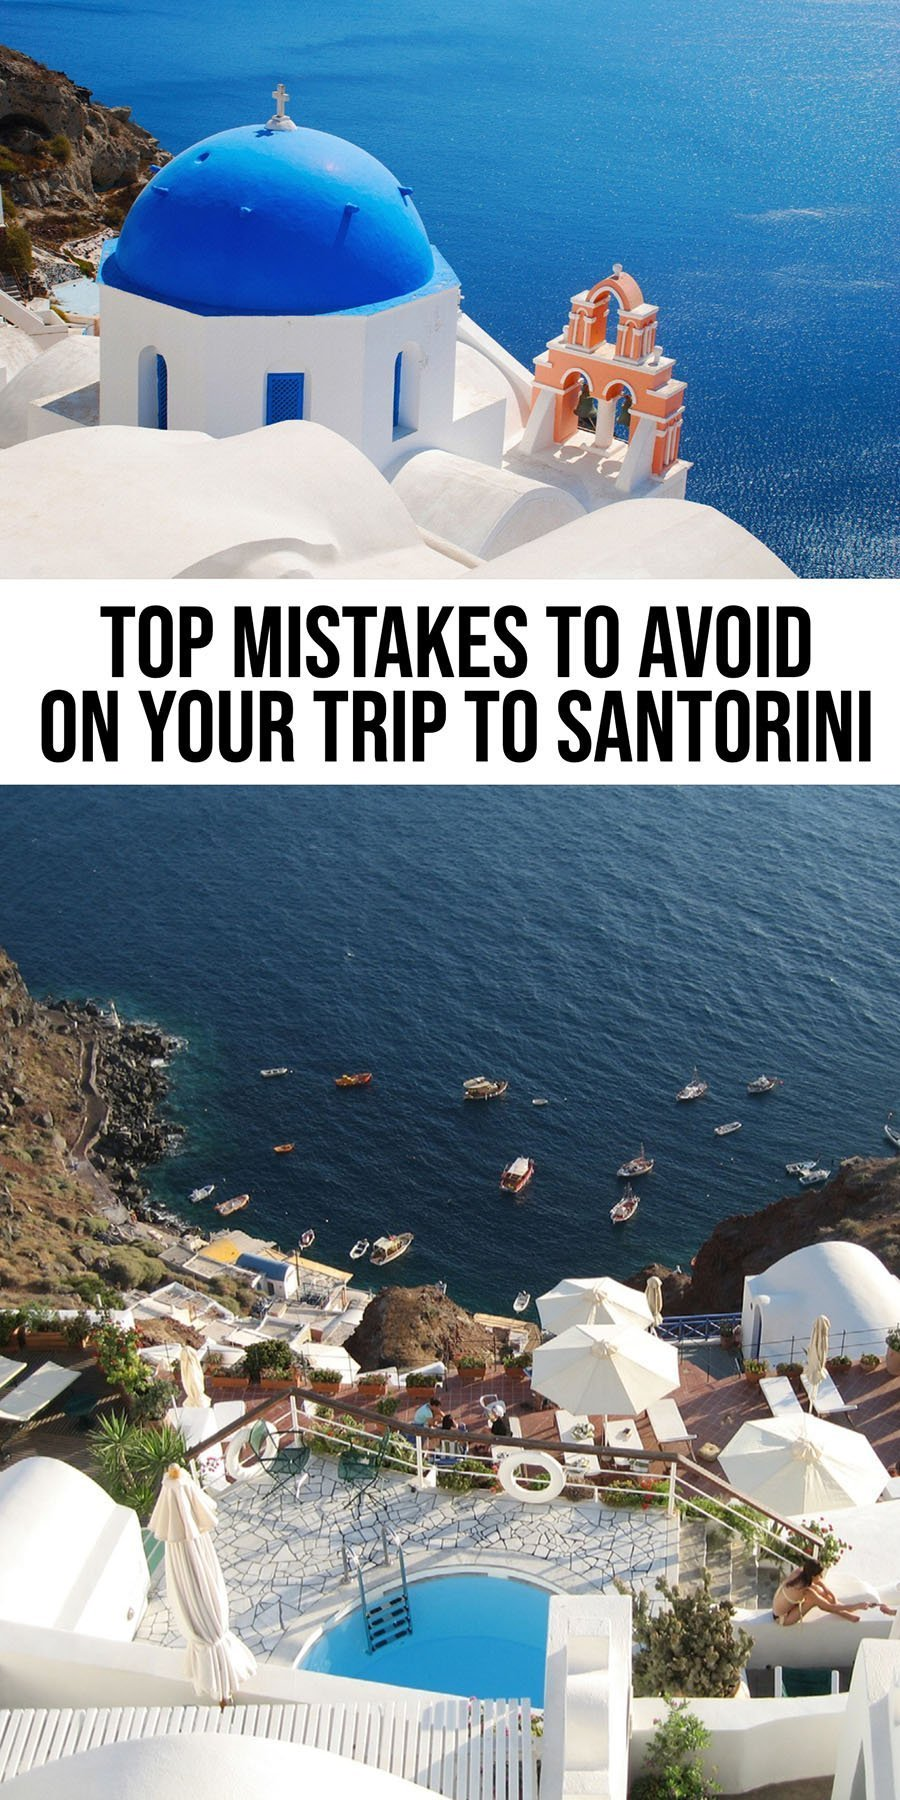 Mistakes to Avoid on your Trip to Santorini